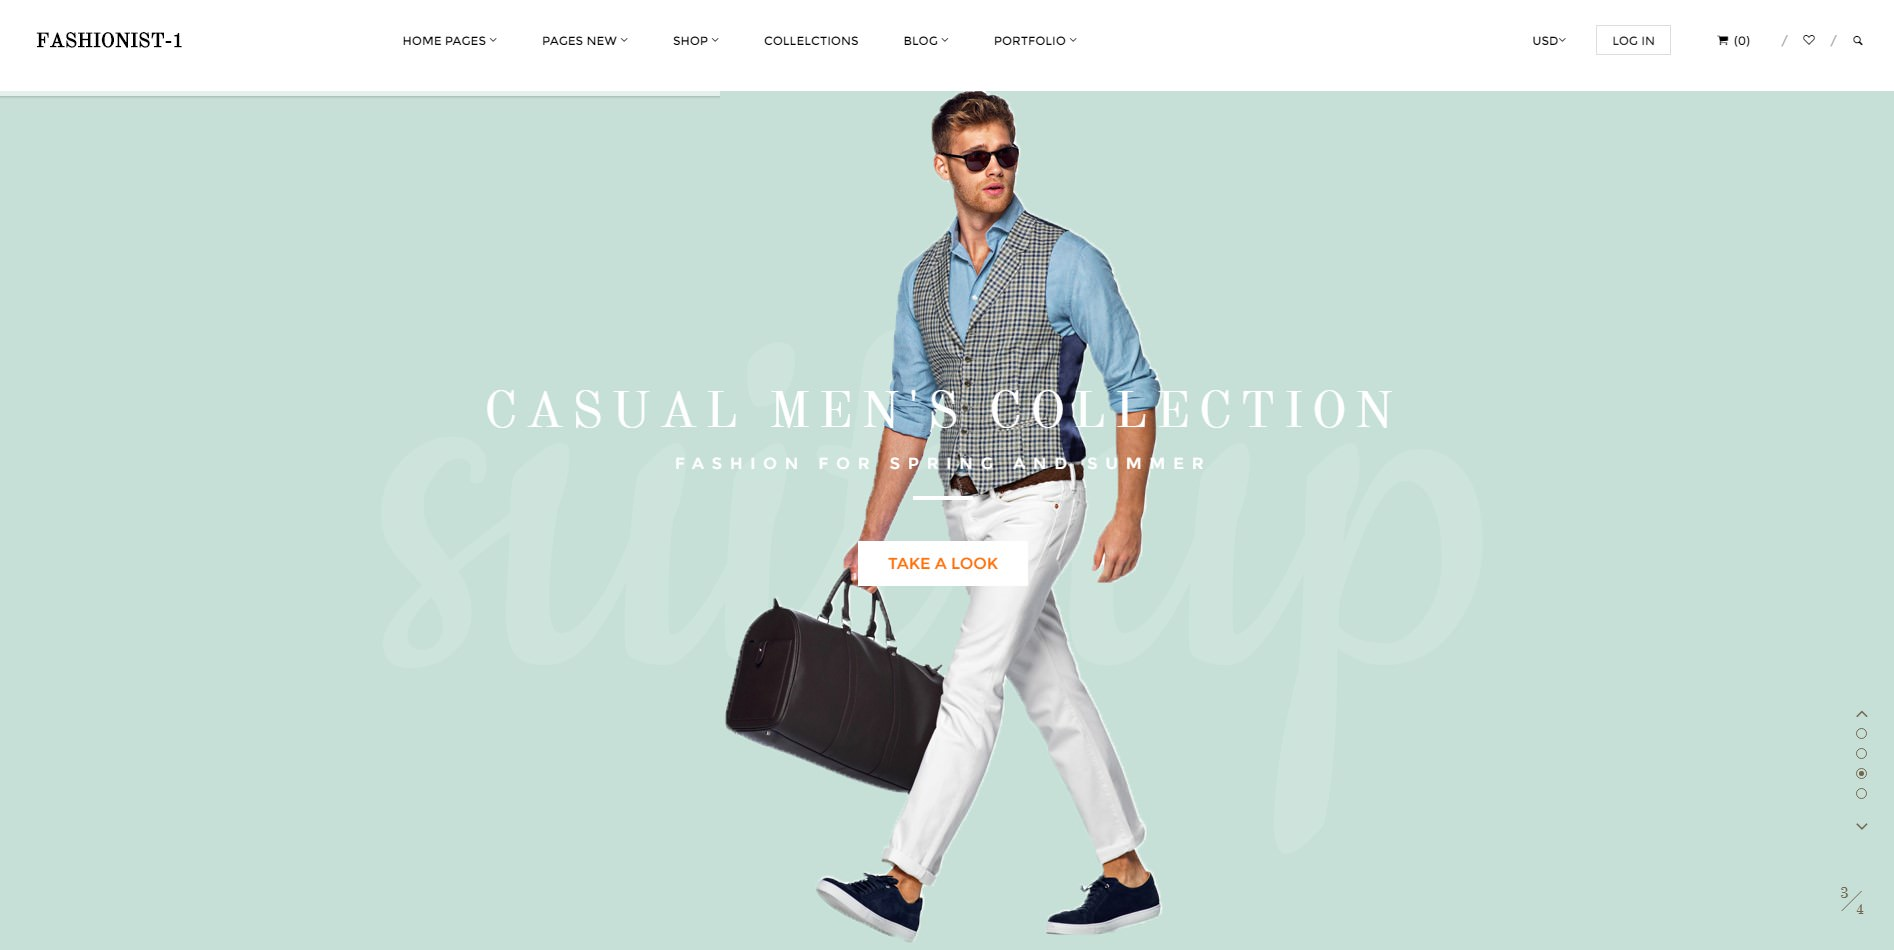 Fashionist theme